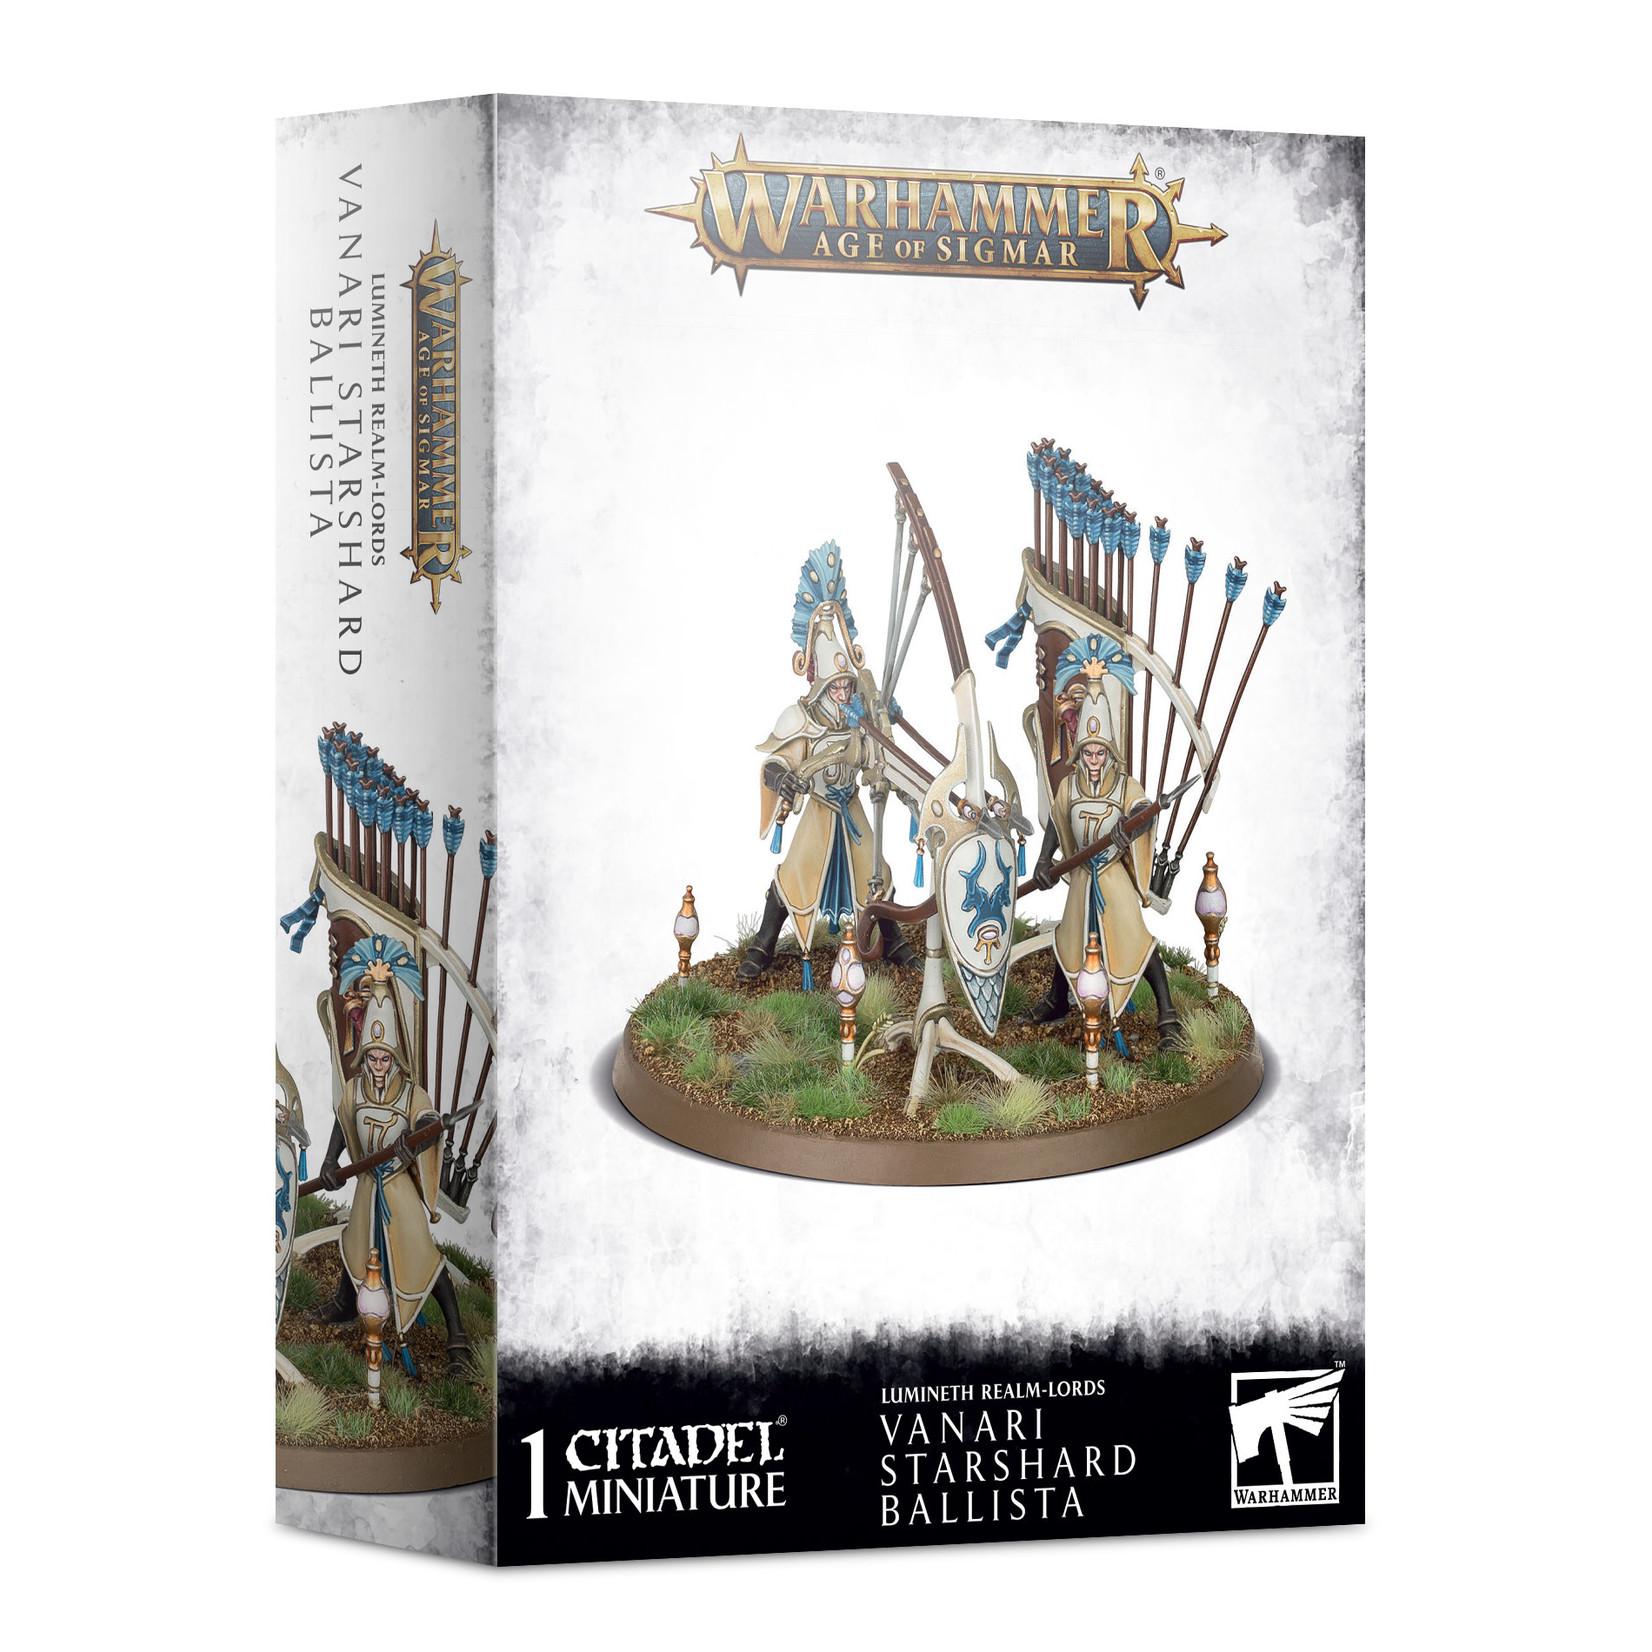 Games Workshop Warhammer Age of Sigmar: Lumineth Realm-Lords - Vanari Starshard Ballista